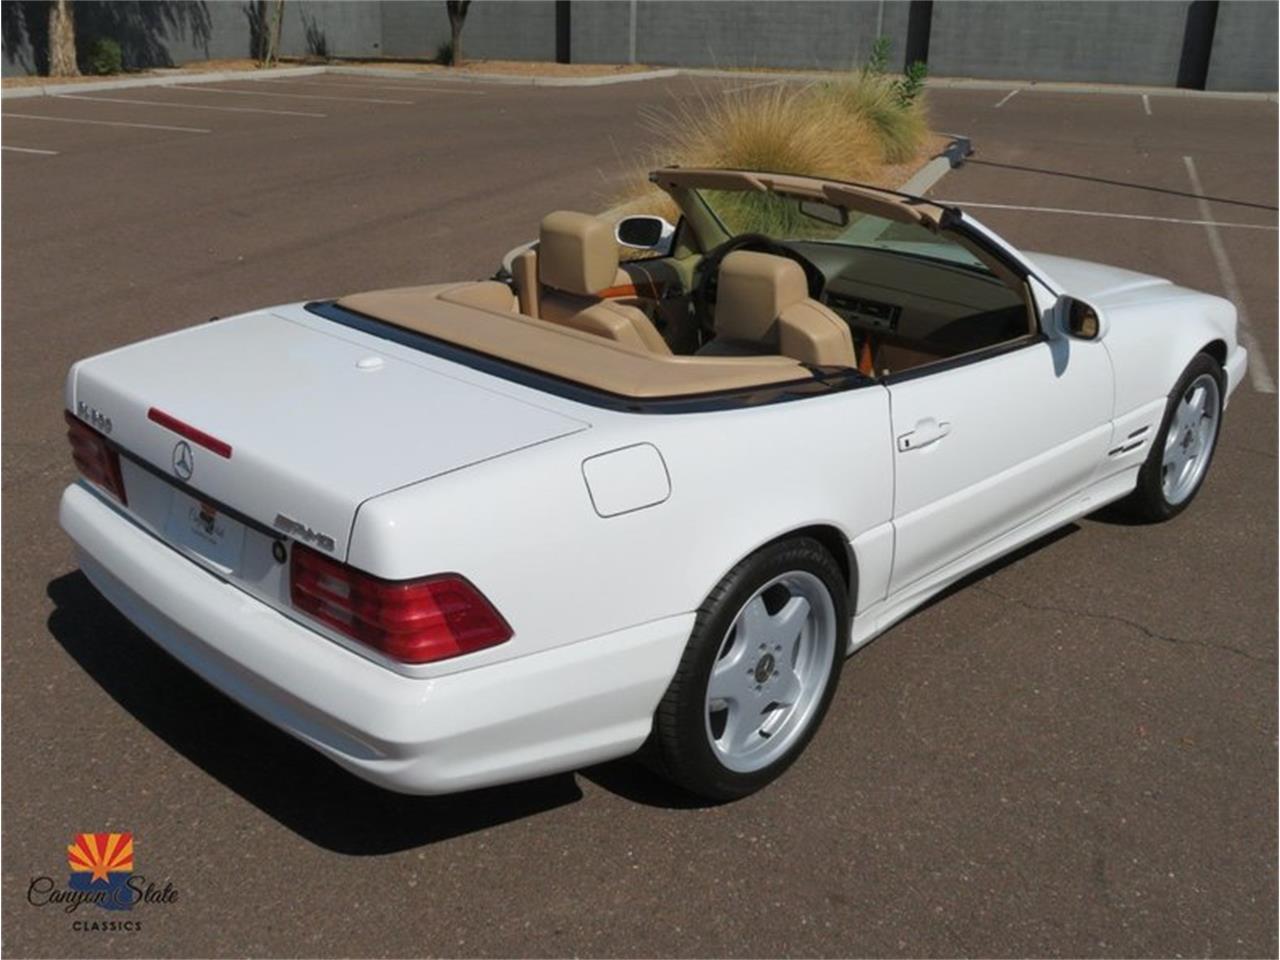 2002 Mercedes-Benz SL-Class (CC-1368478) for sale in Tempe, Arizona